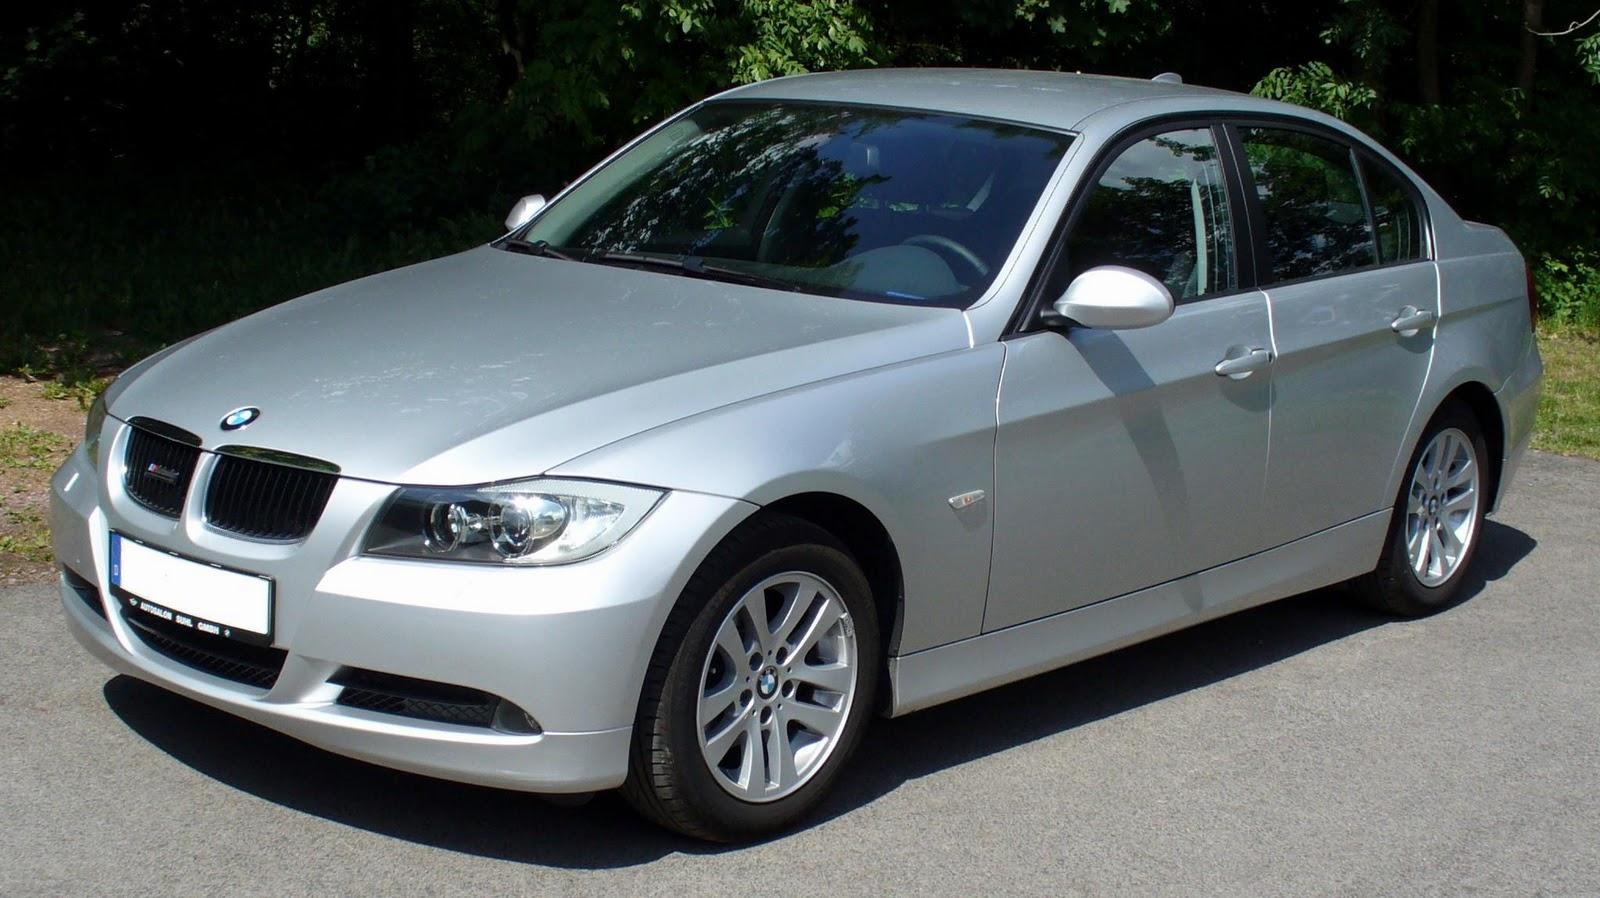 BMW Widescreen Wallpaper: BMW 3 Series Silver Wallpaper 2